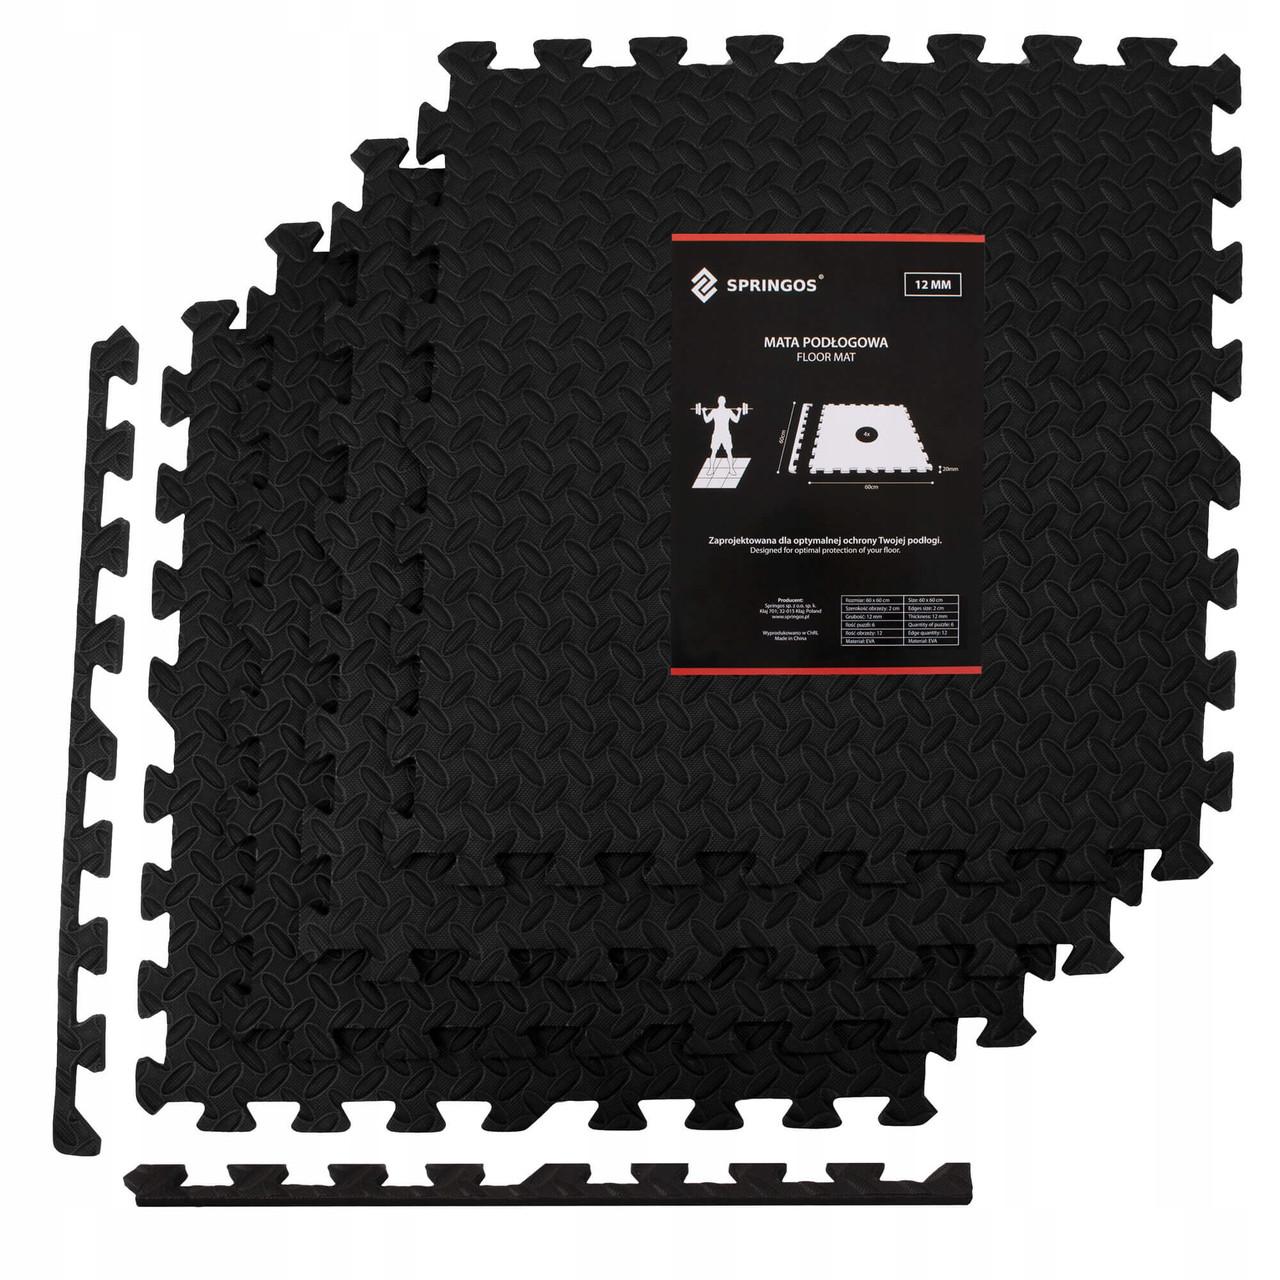 Мат-пазл (ласточкин хвост) Springos Mat Puzzle EVA 120 x 120 x 1.2 cм FM0004 Black